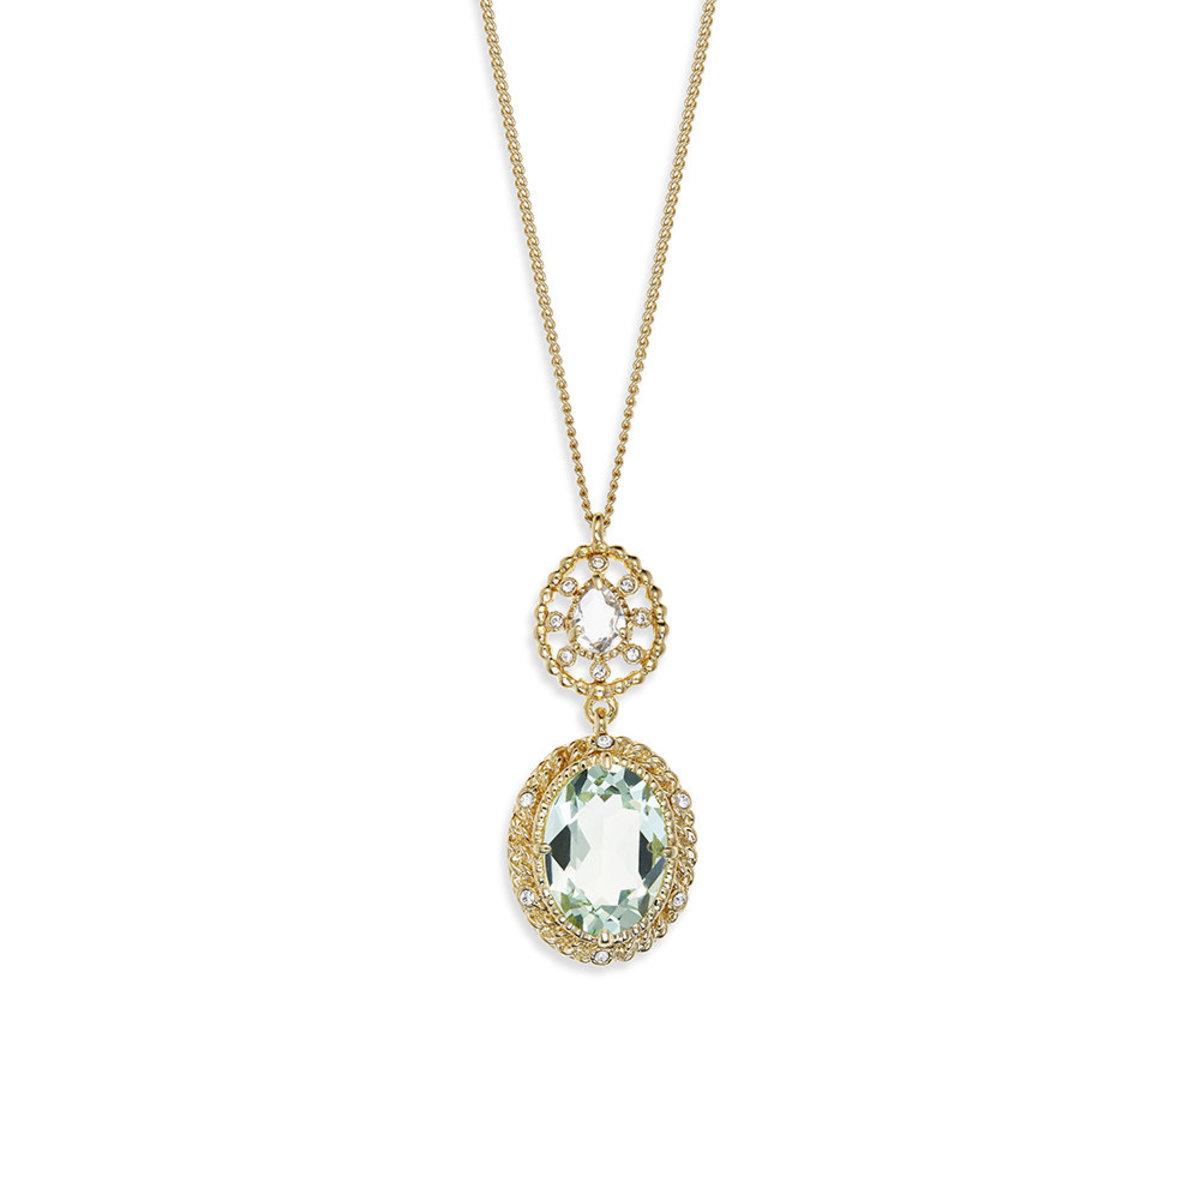 Eclat Palette: light gold plating, Swarovski chrysolite/clear crystal, pendant necklace